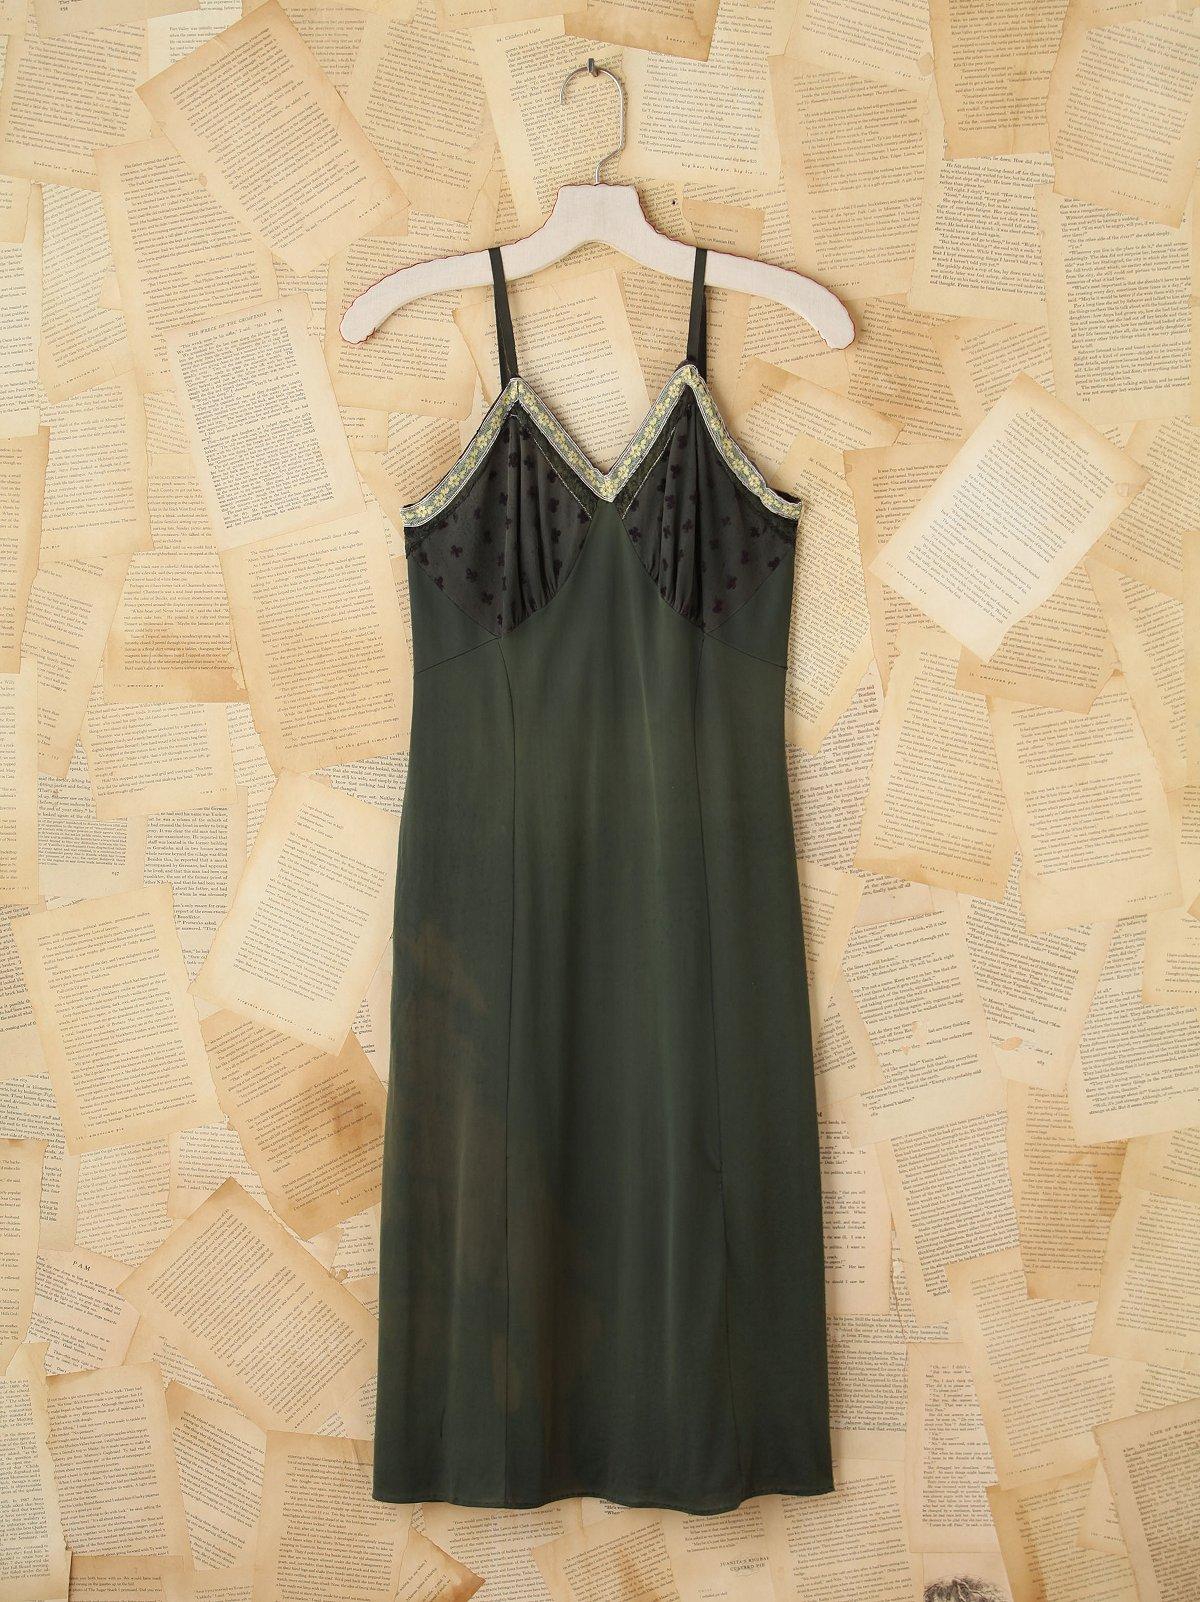 Vintage Sleeveless Slip Dress